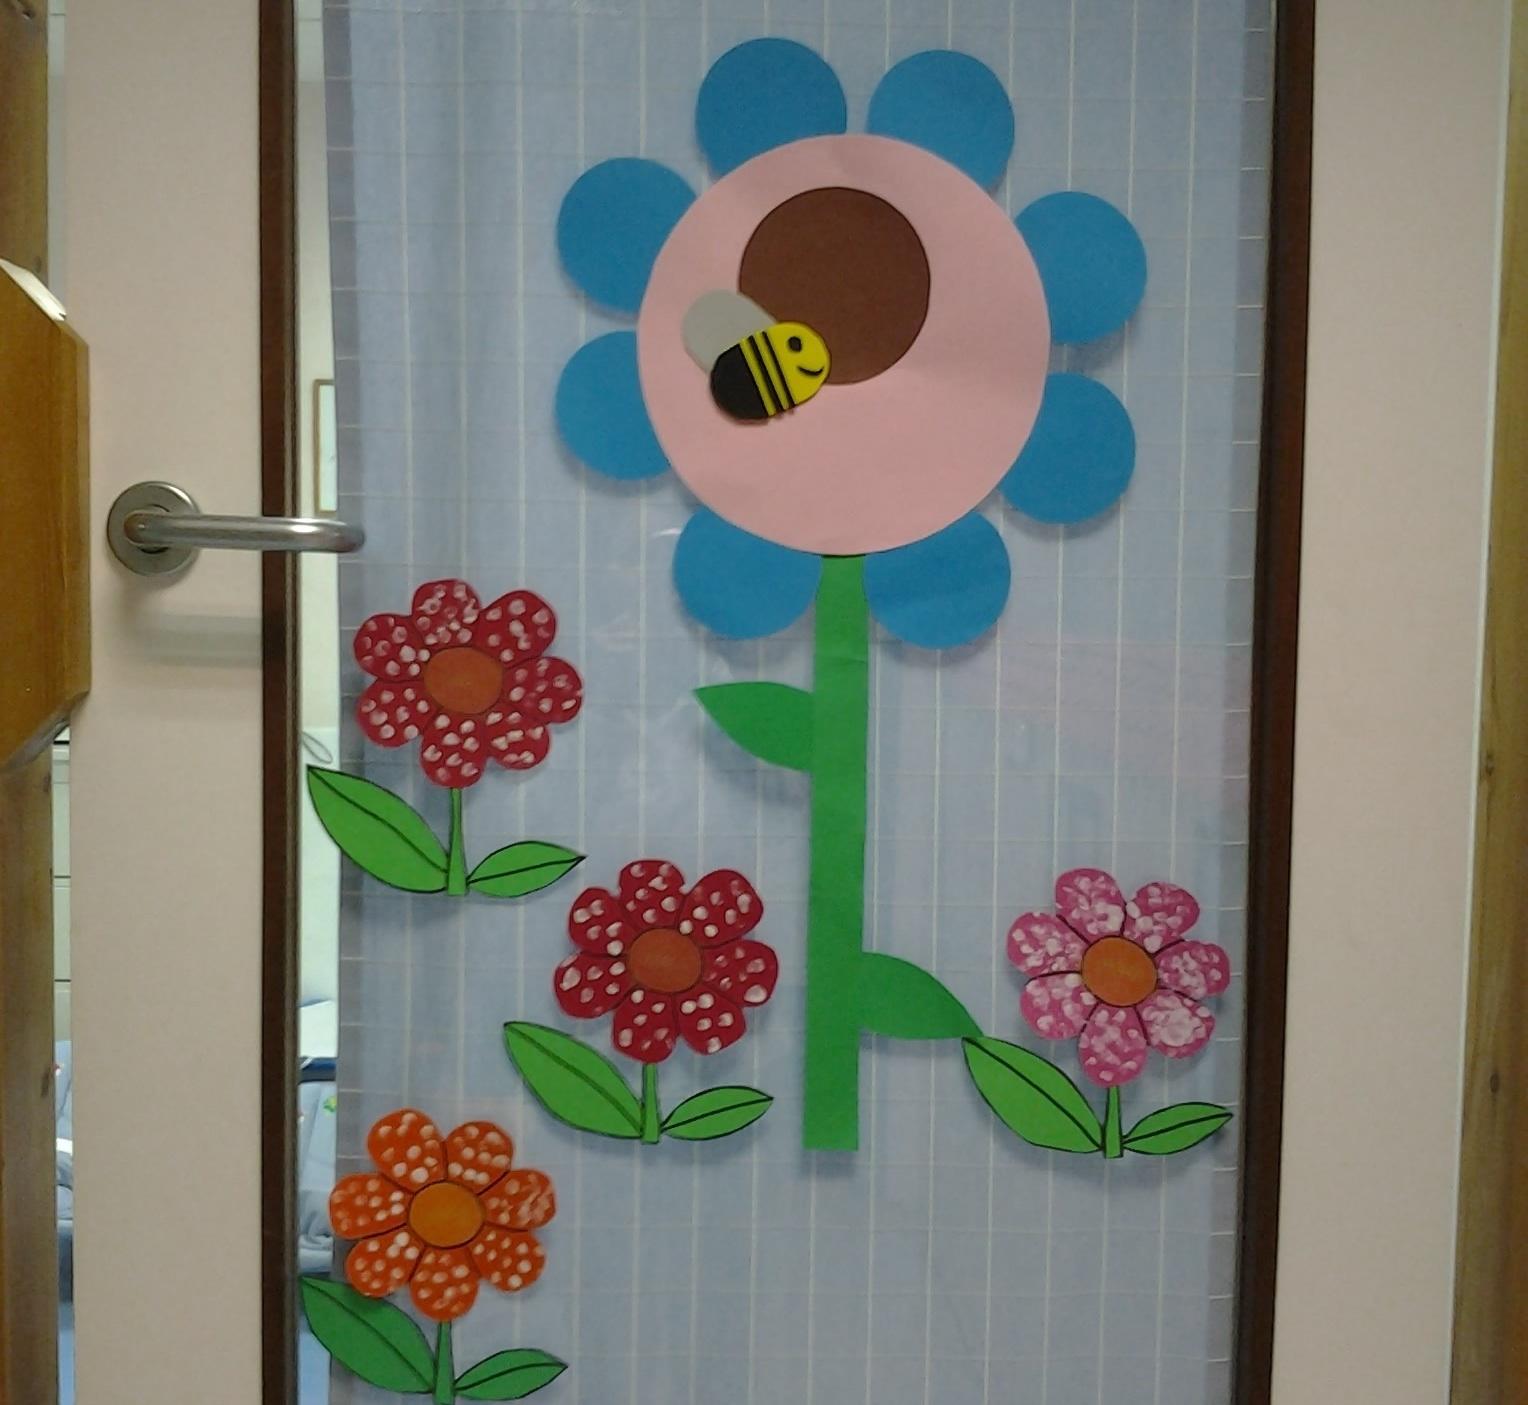 Primavera puertas 23 imagenes educativas - Fotografias para decorar ...